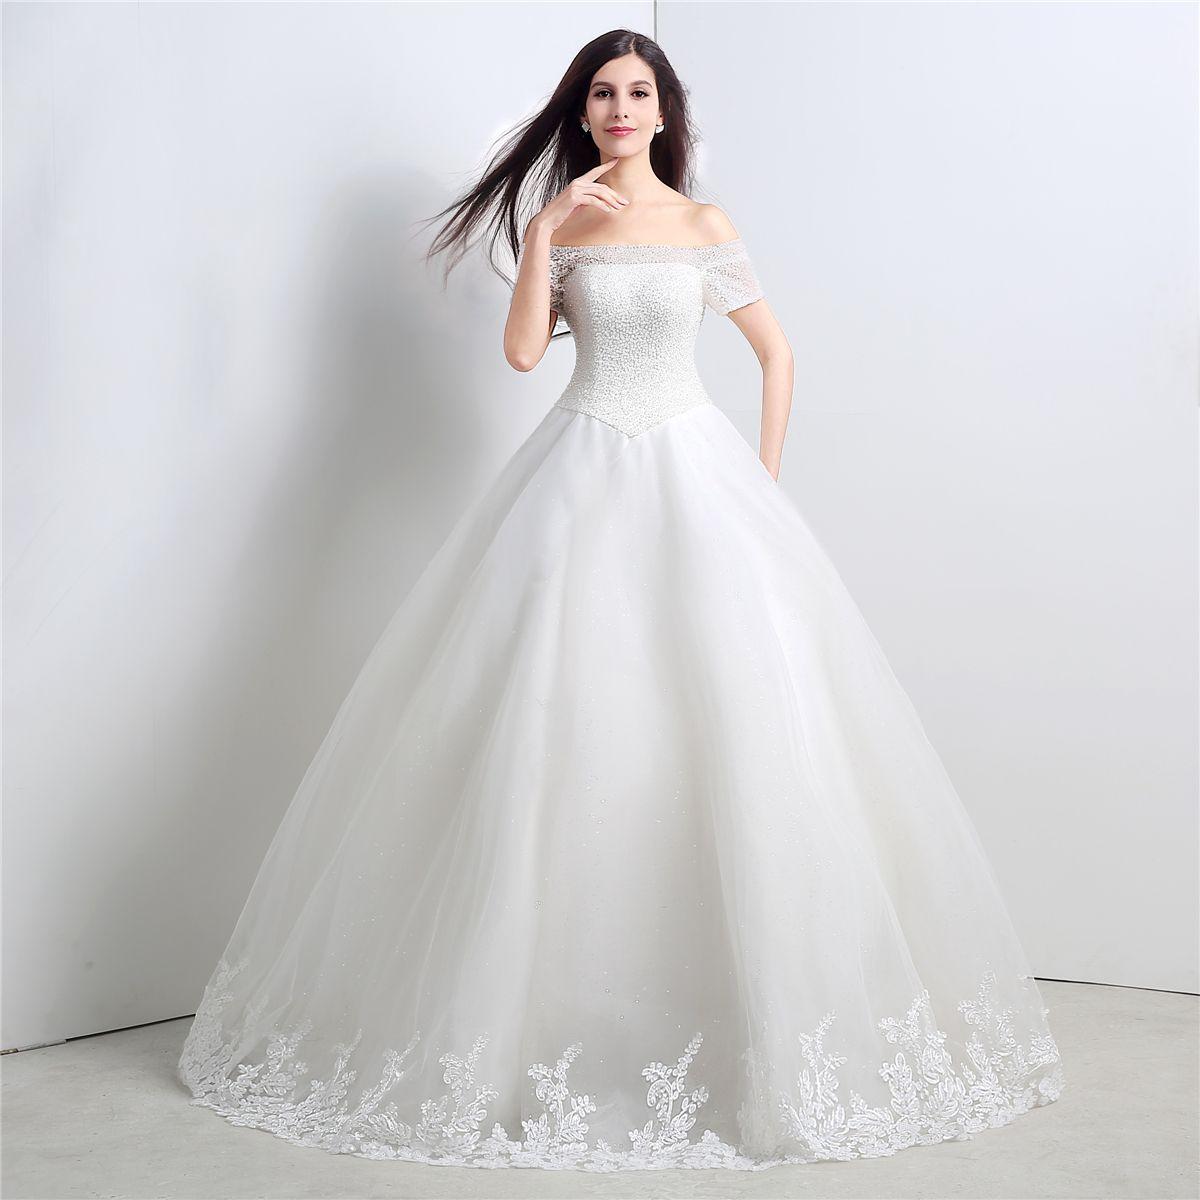 Lace-Boot-Ausschnitt Brautkleider